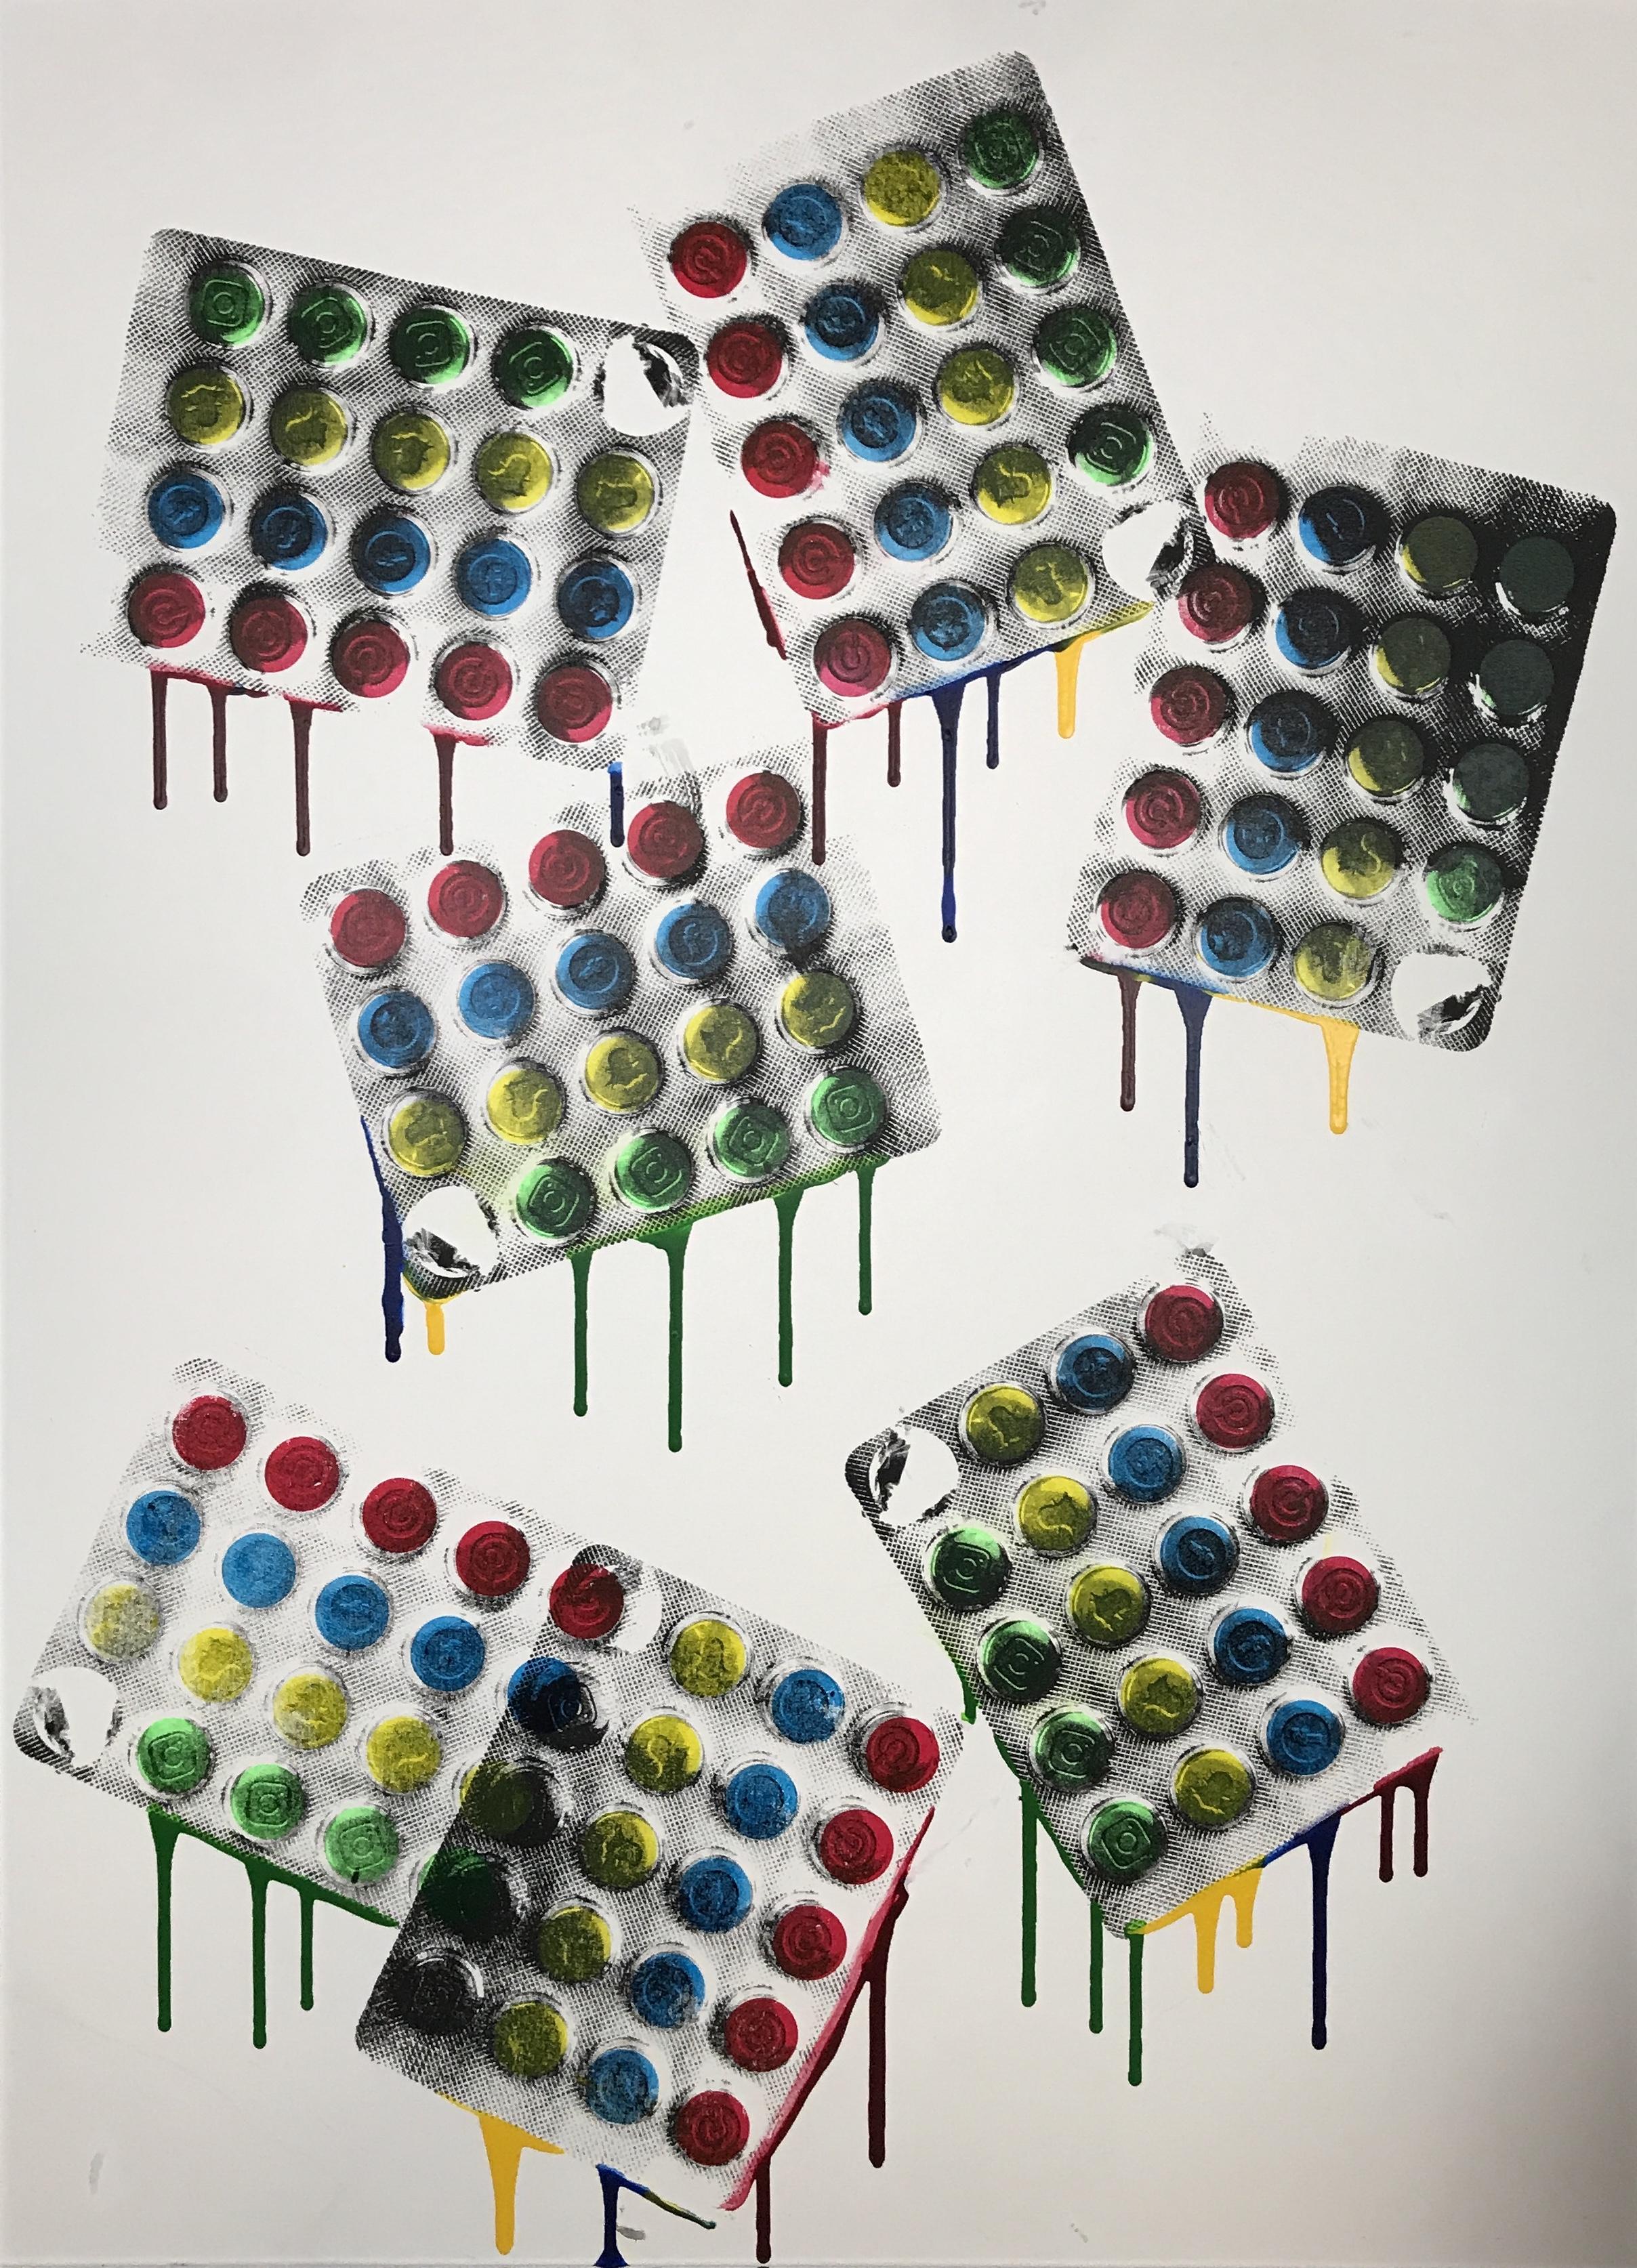 blista twista 1/1 - 42.5 x 58.5 Acrylic on Canvas, Jan '18Buyer Inquiry